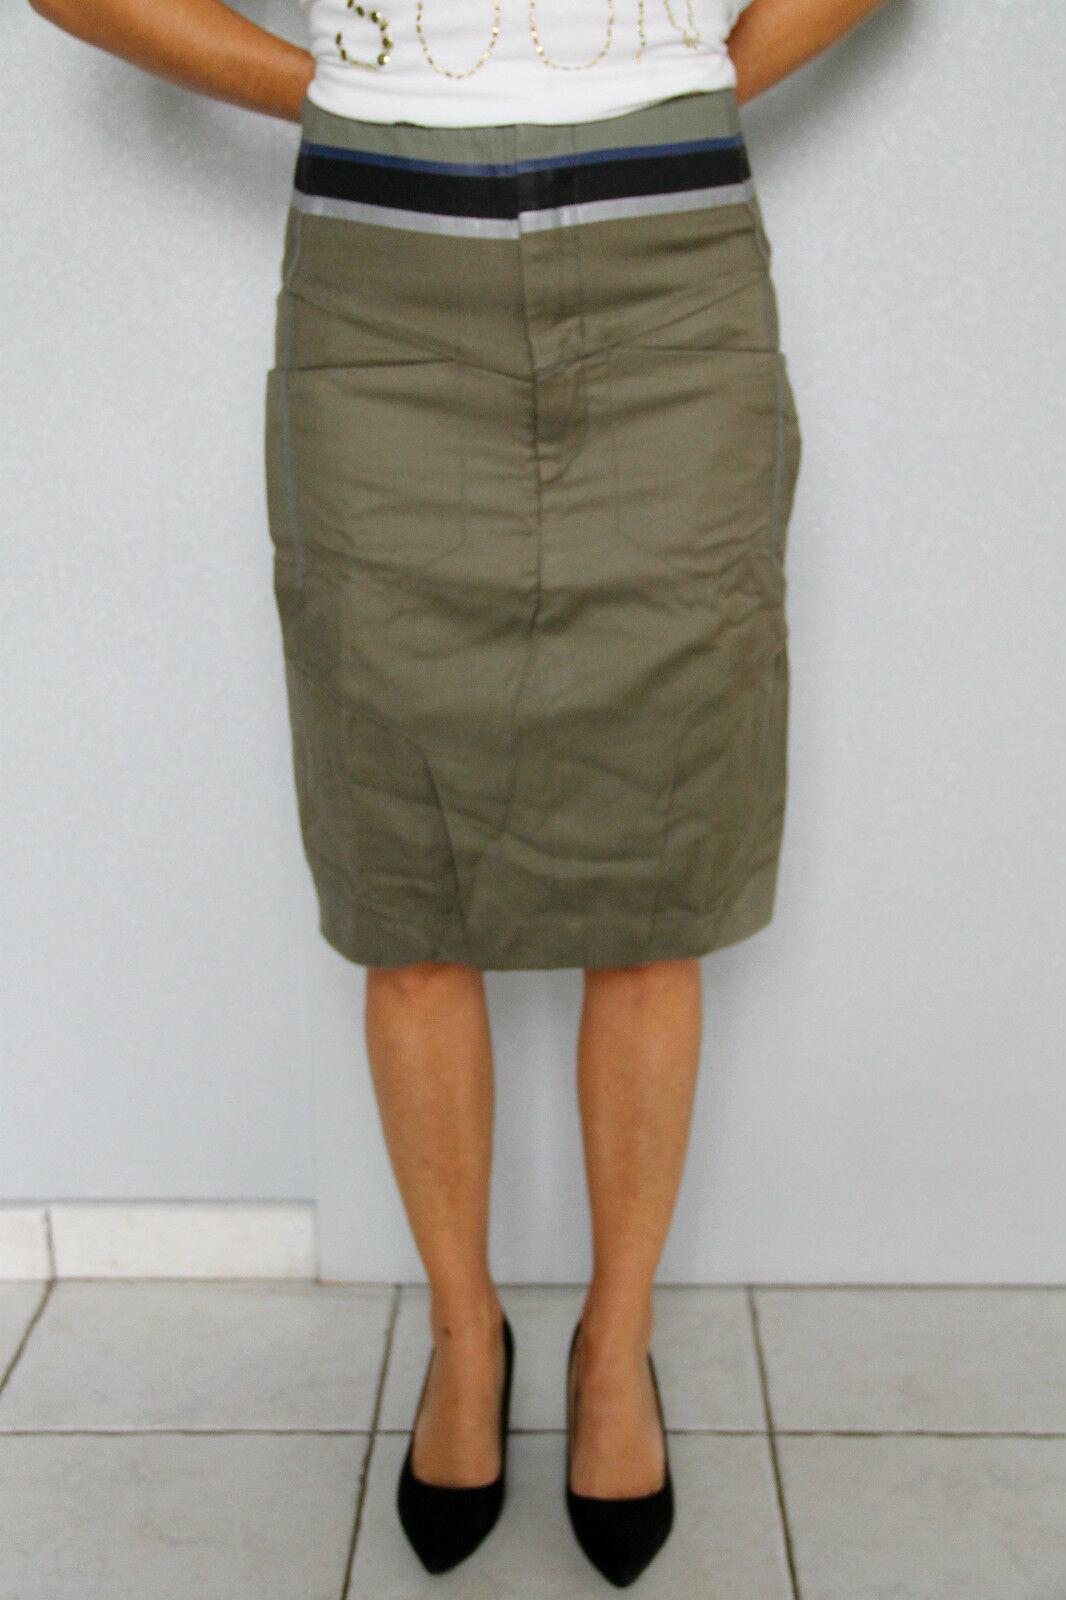 Skirt khaki linen cotton M+ F GIRBAUD saritabli T 33 (42-44) NEW LABEL val